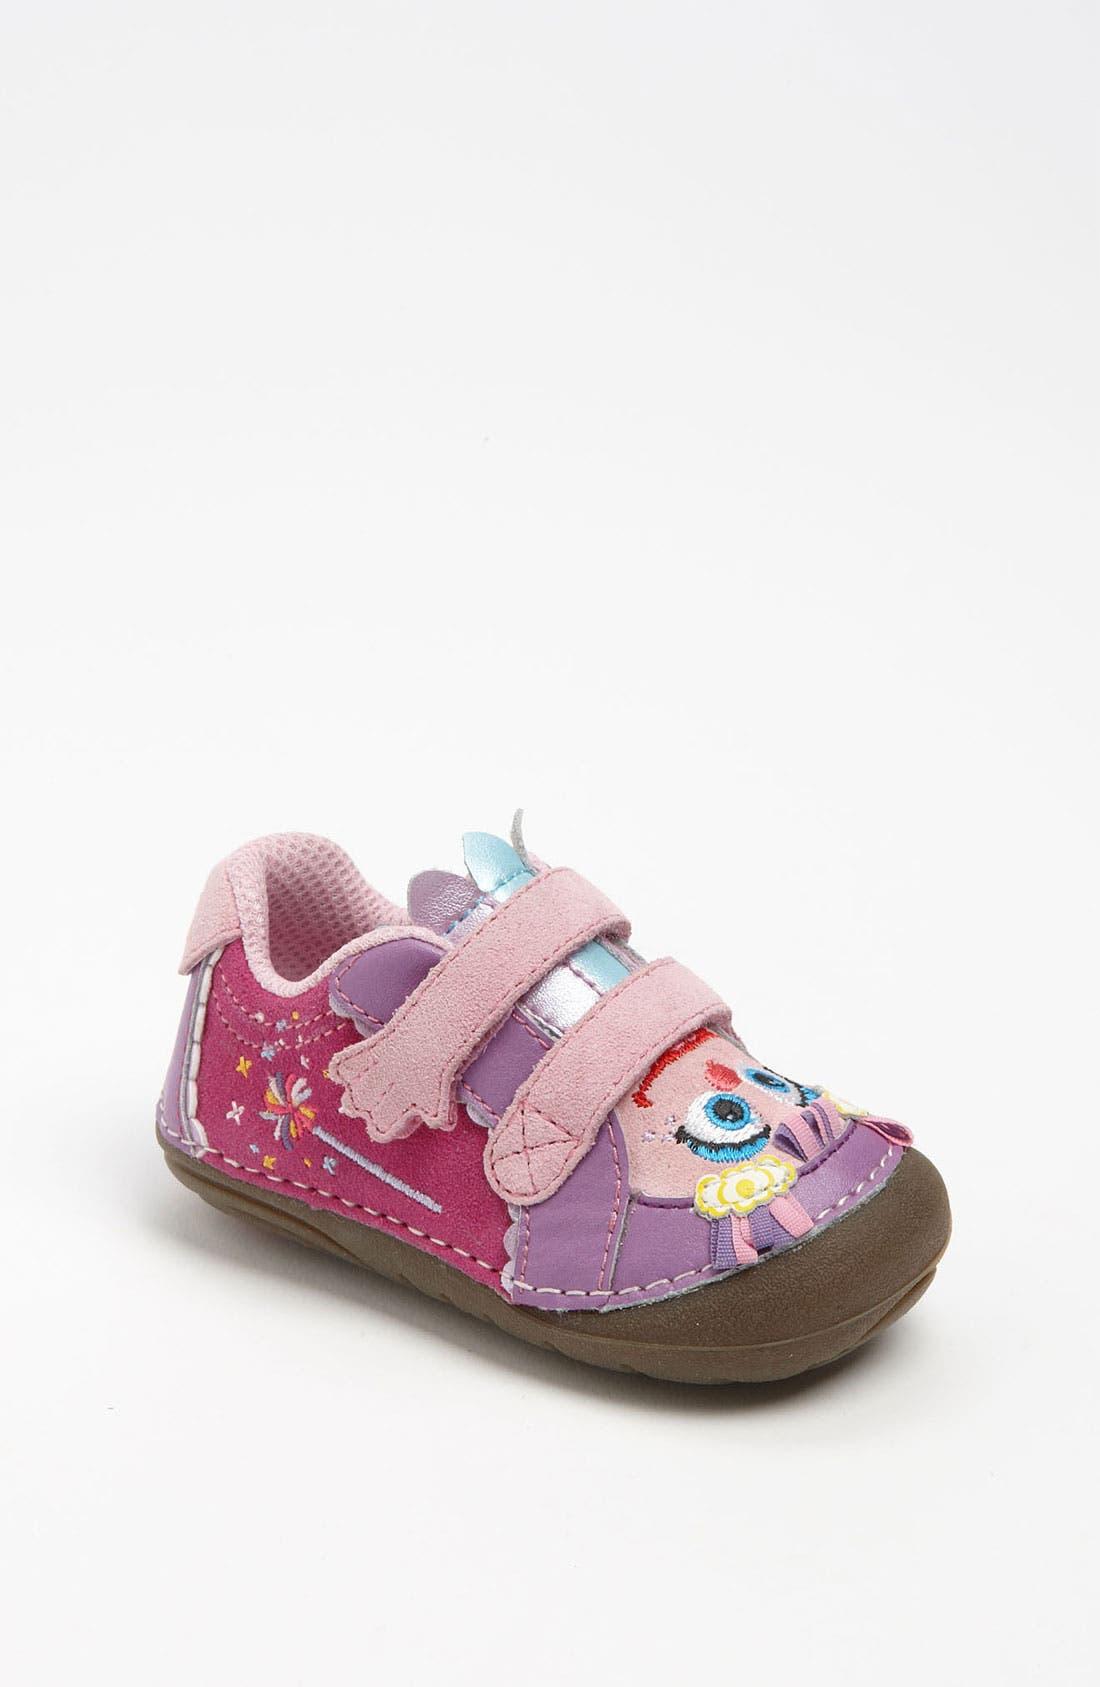 Main Image - Stride Rite 'Sesame Street® - Abby Cadaby' Sneaker (Baby & Walker)